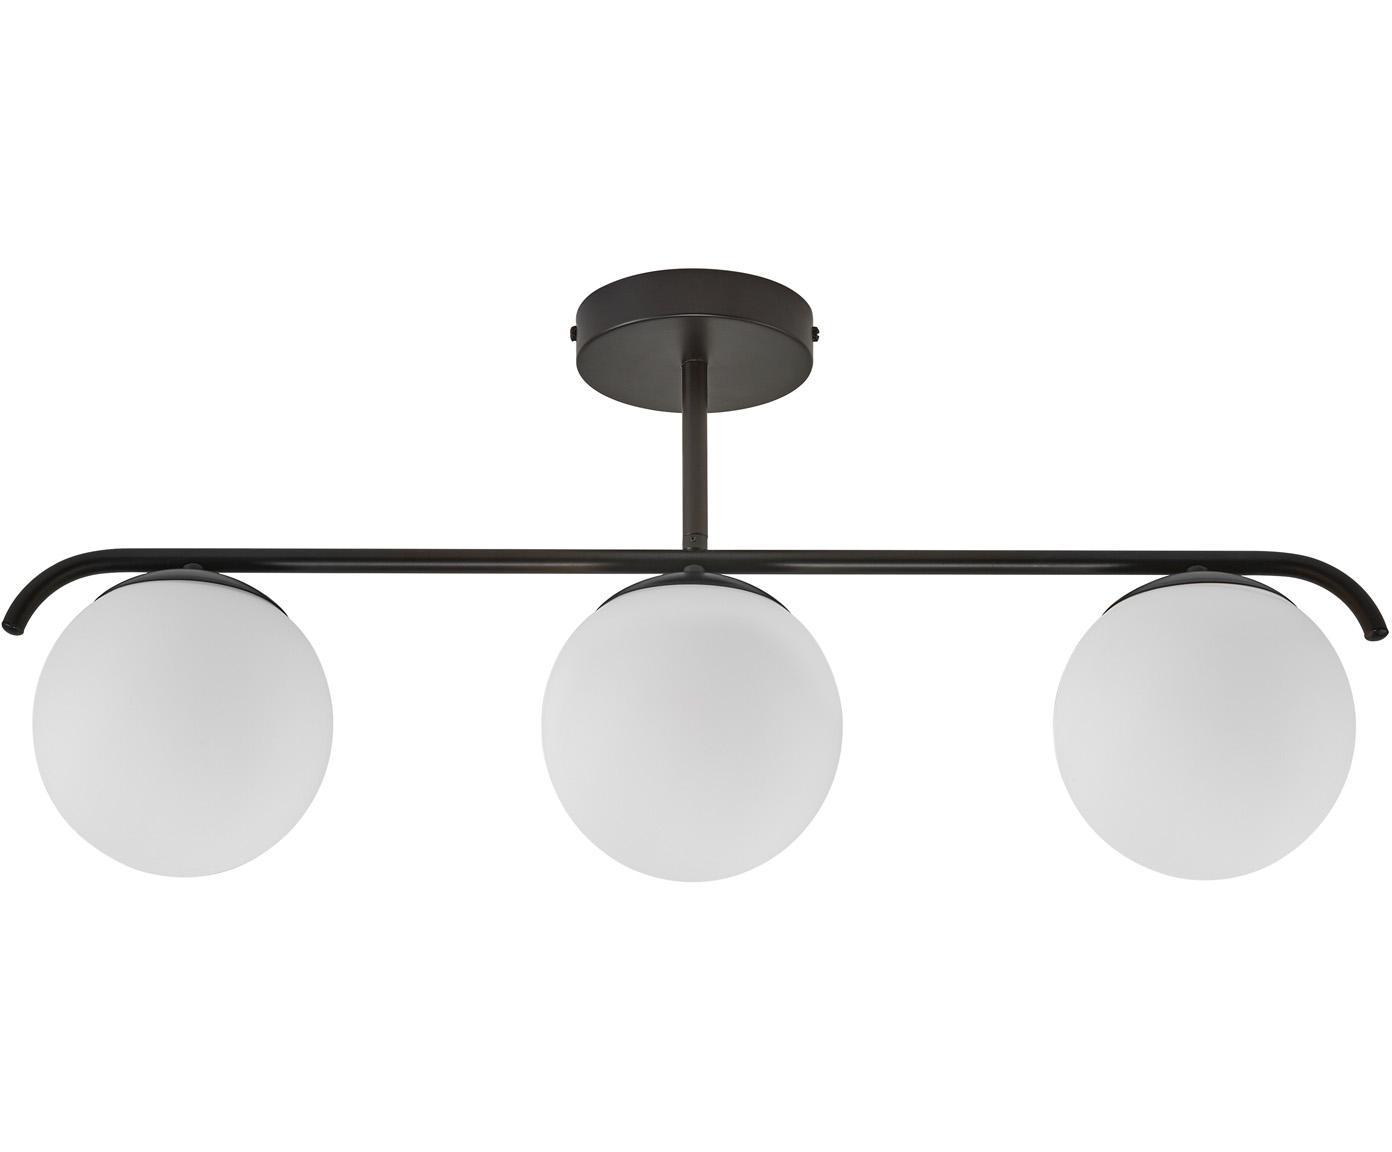 Deckenleuchte Grant aus Opalglas, Lampenschirm: Opalglas, Baldachin: Metall, beschichtet, Weiß, Schwarz, 70 x 30 cm